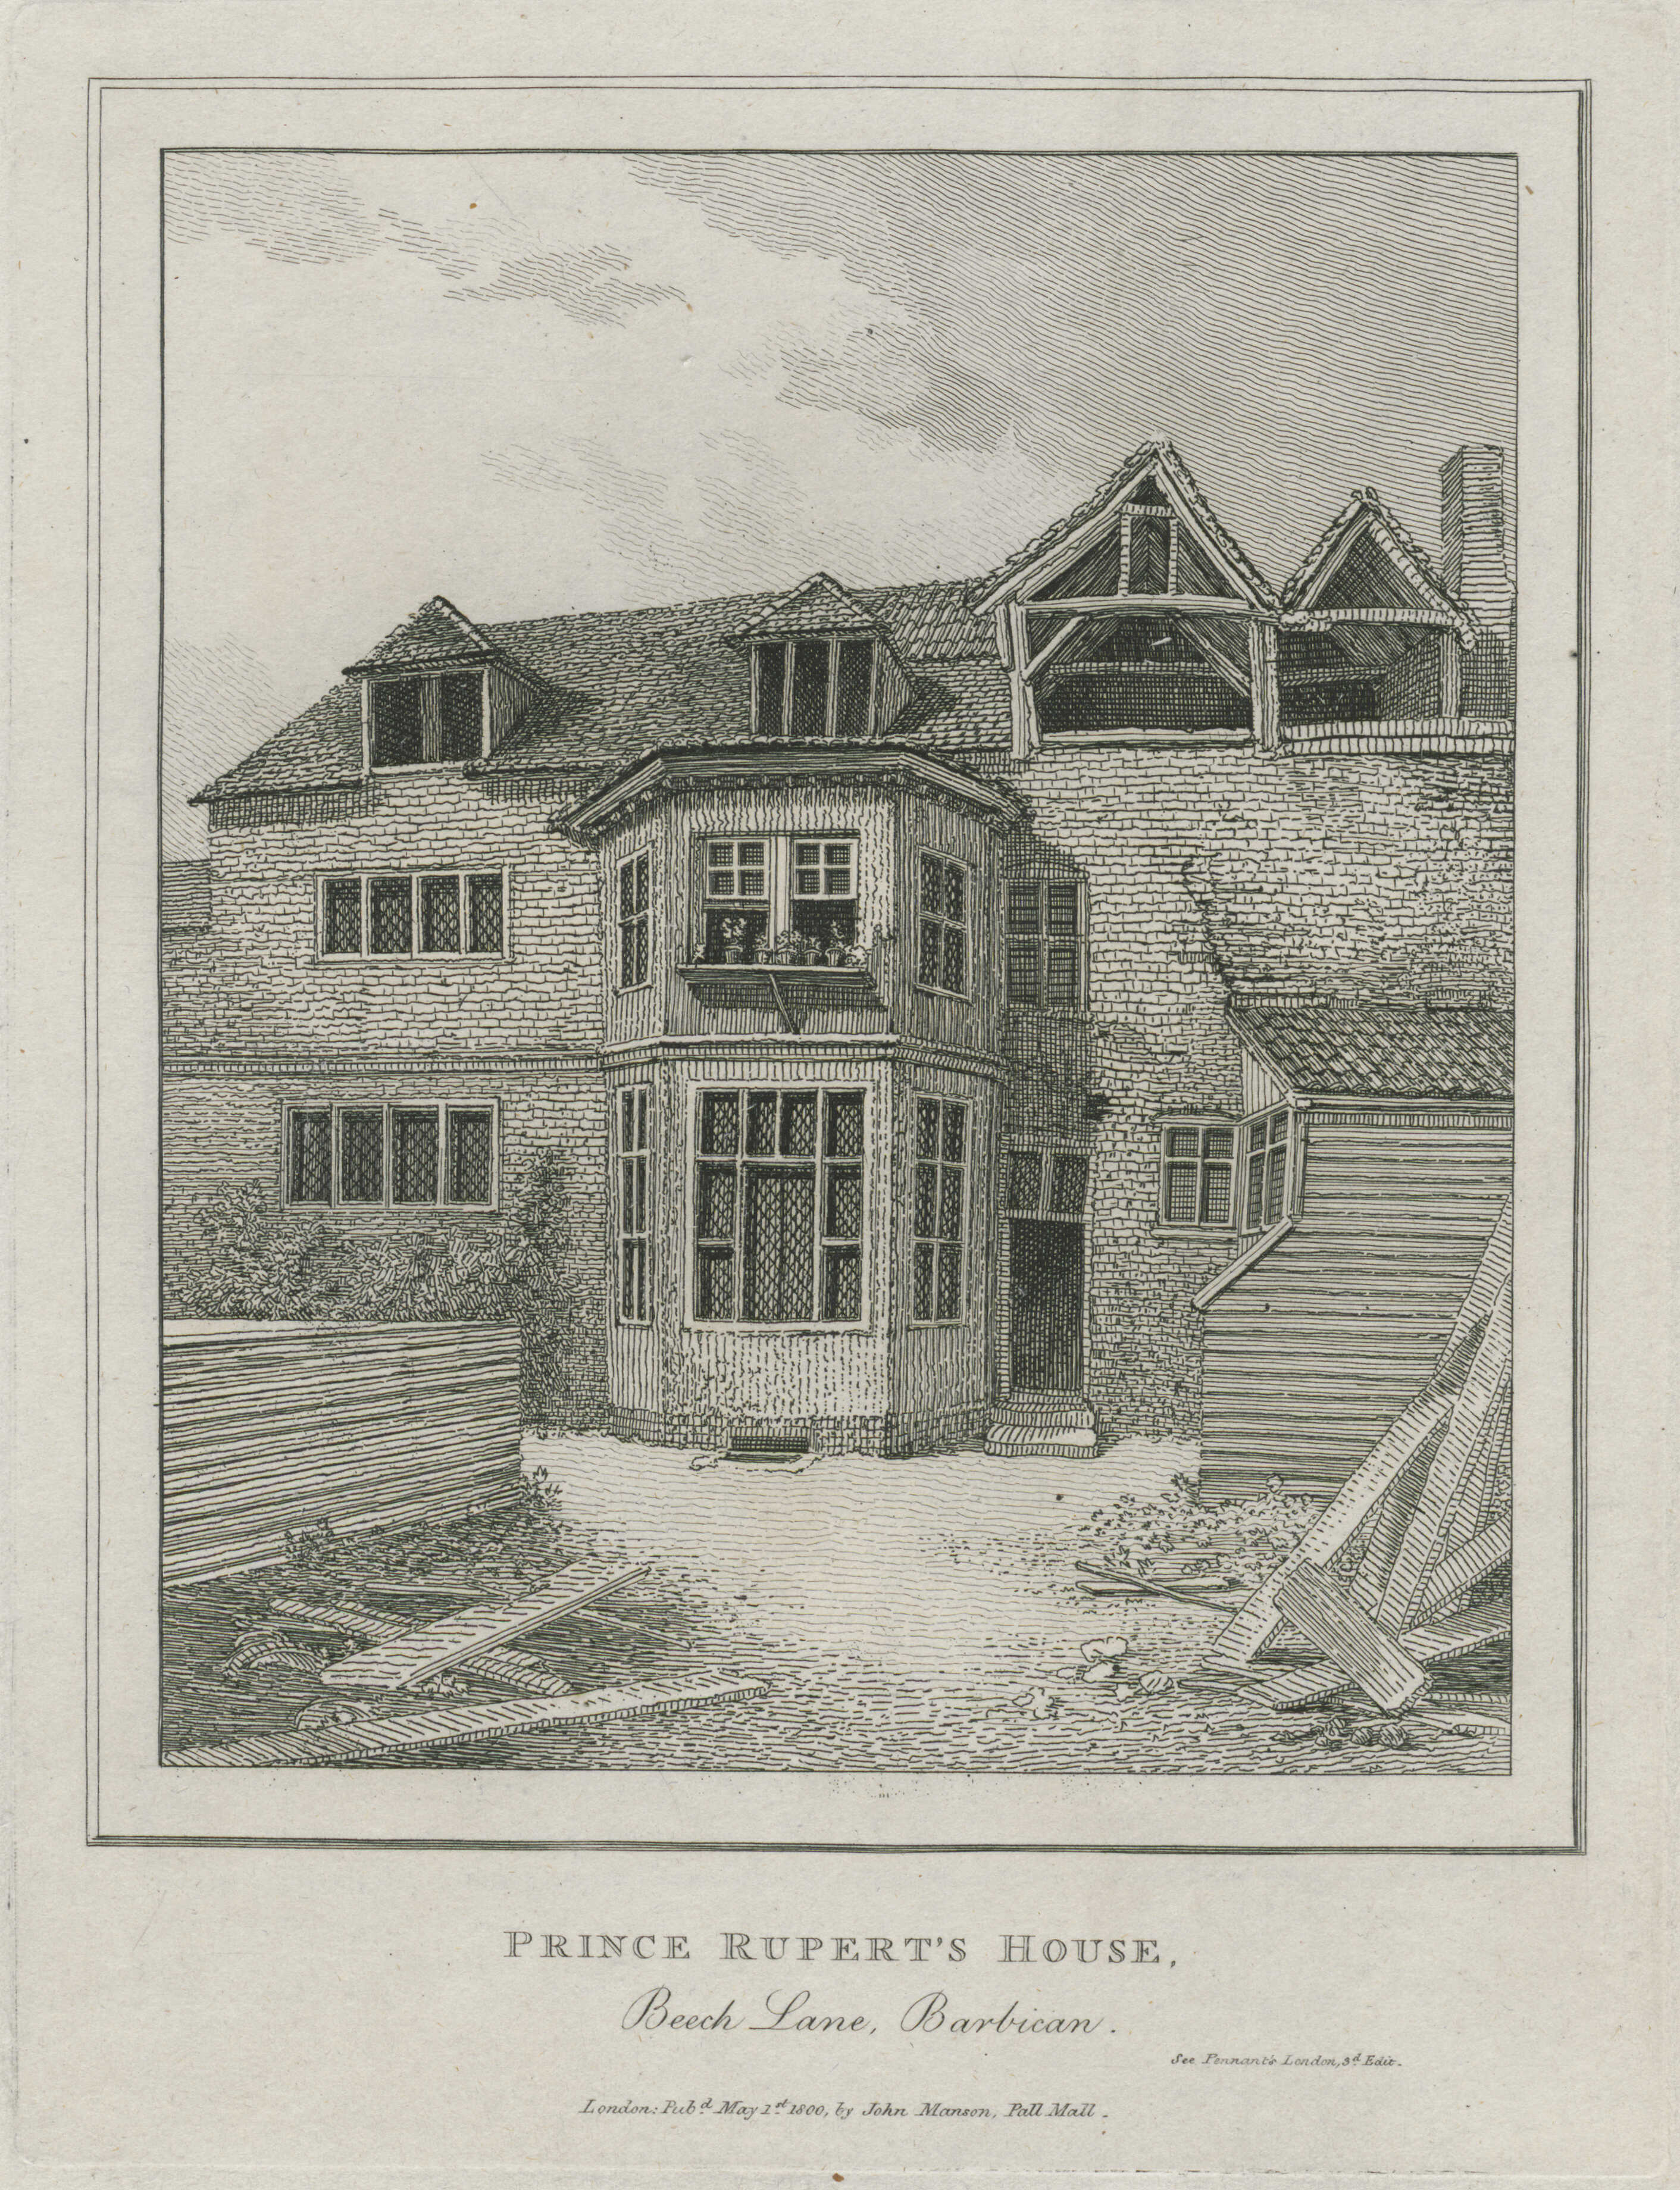 76-prince-ruperts-house-beech-lane-barbican